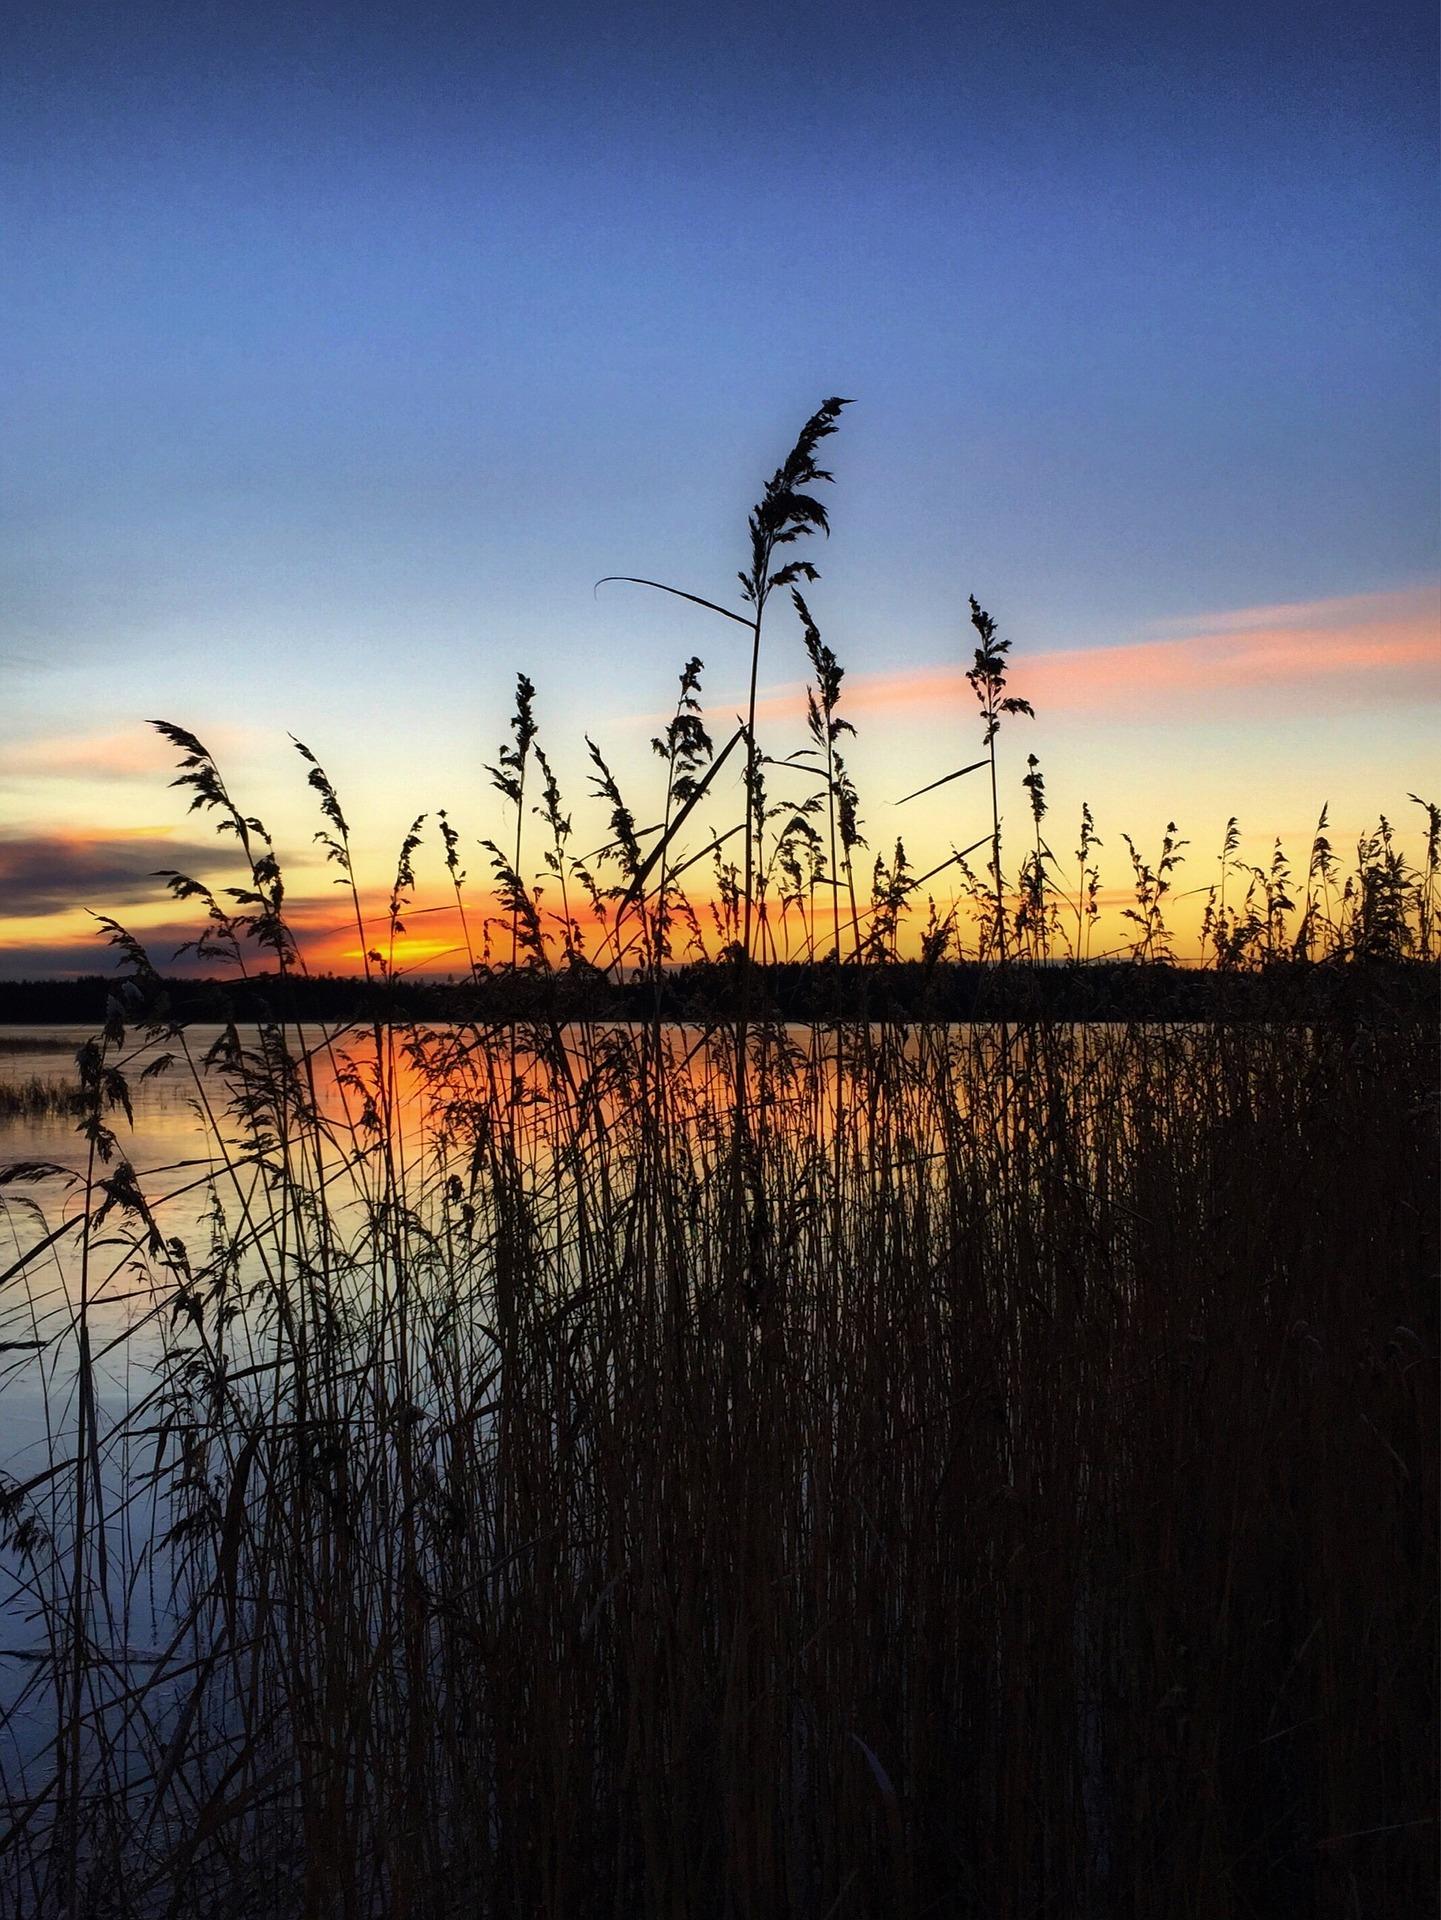 sunset-1519833_1920